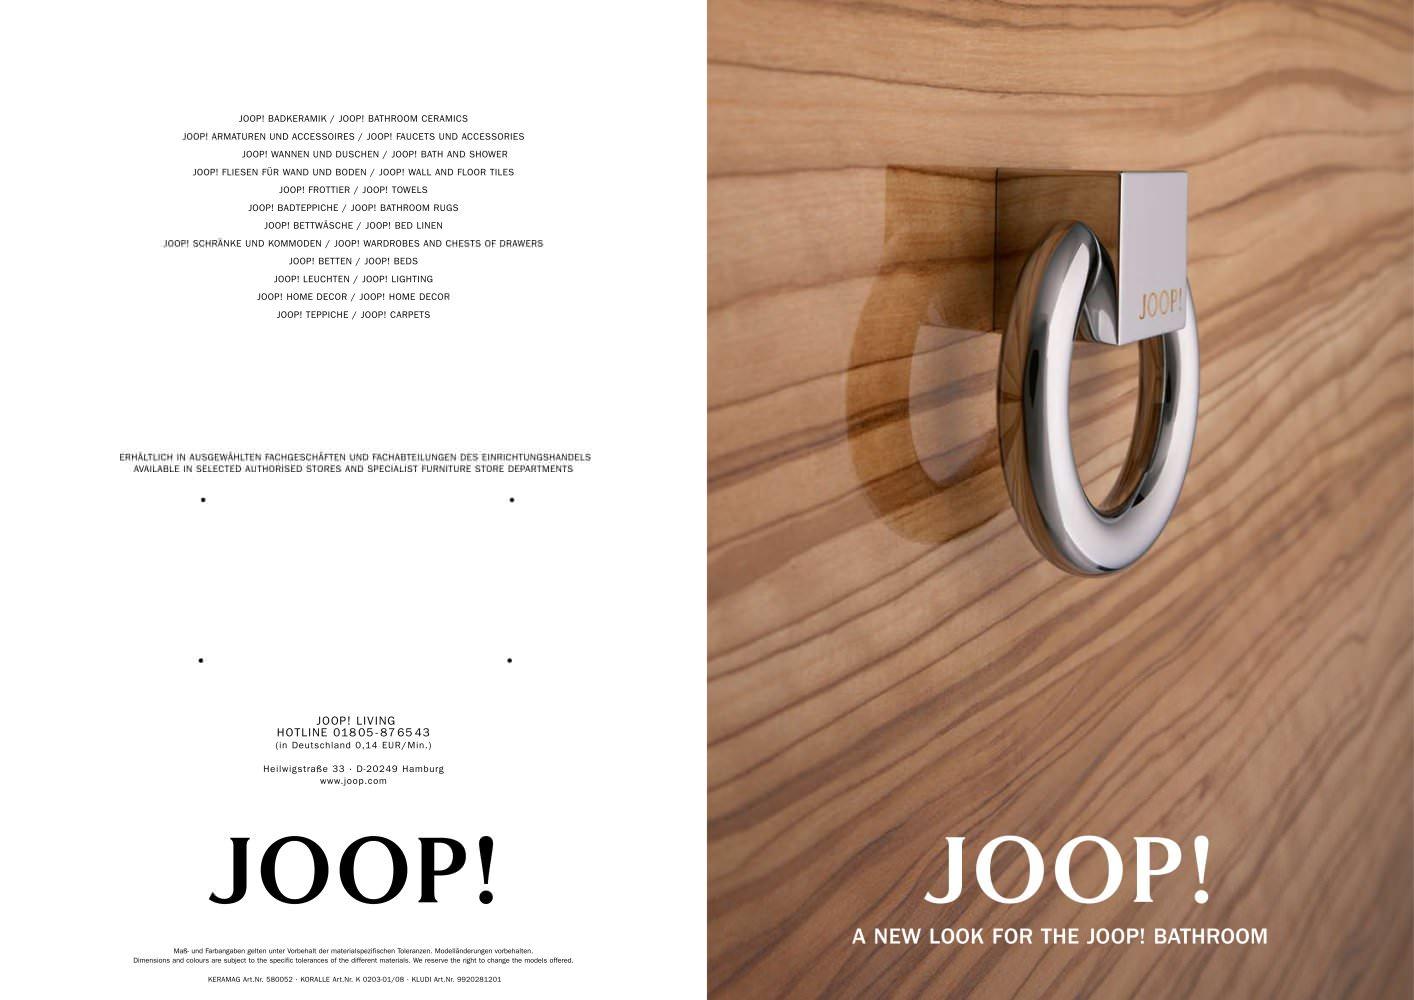 Blickfang Joop Möbel Katalog Ideen Von Bathroom-08